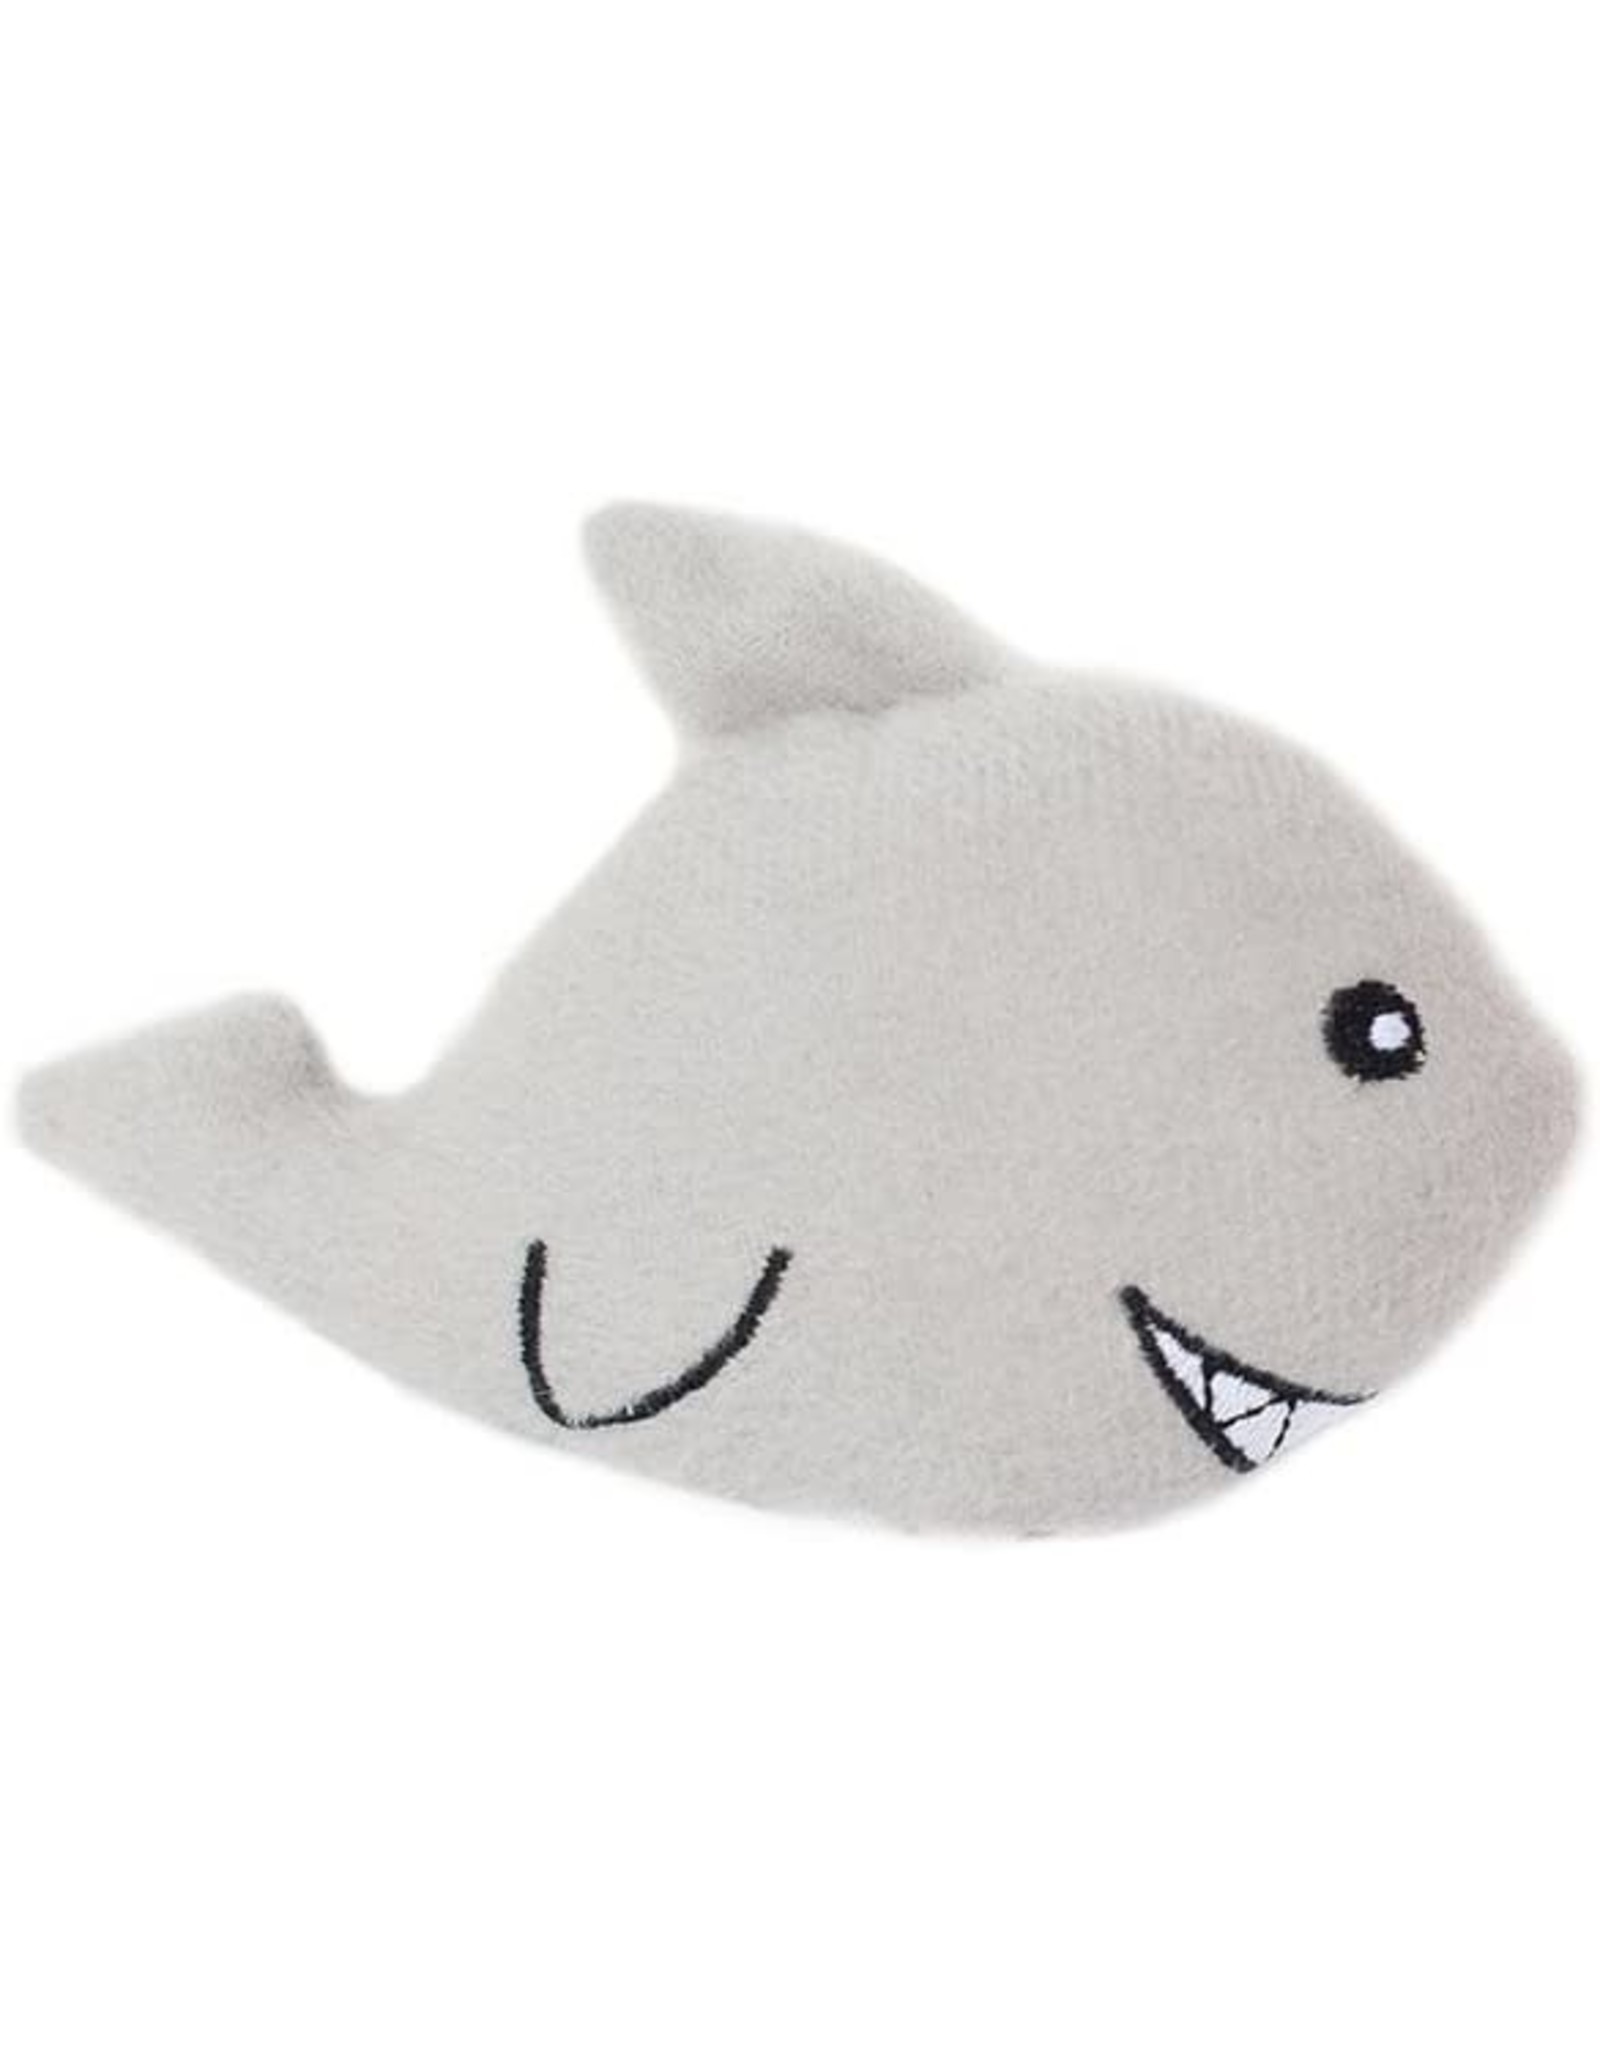 Zippypaws ZIPPYPAWS SHARK MINIZ DOG TOY